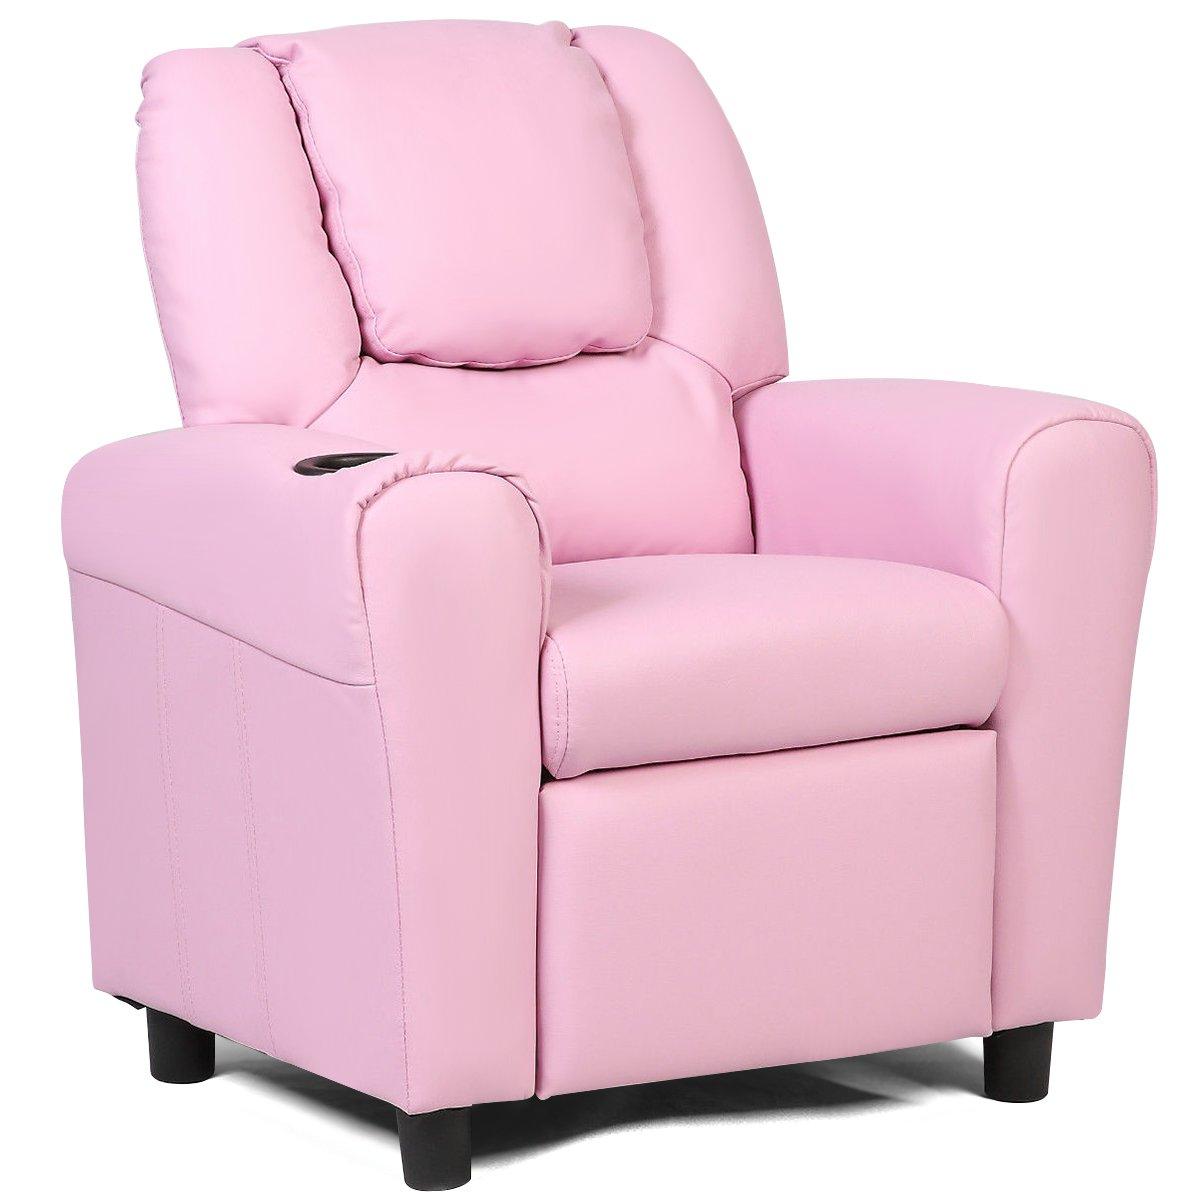 Costzon Children Recliner Kids Sofa Armchair Couch w/Cup Holder (Pink) by Costzon